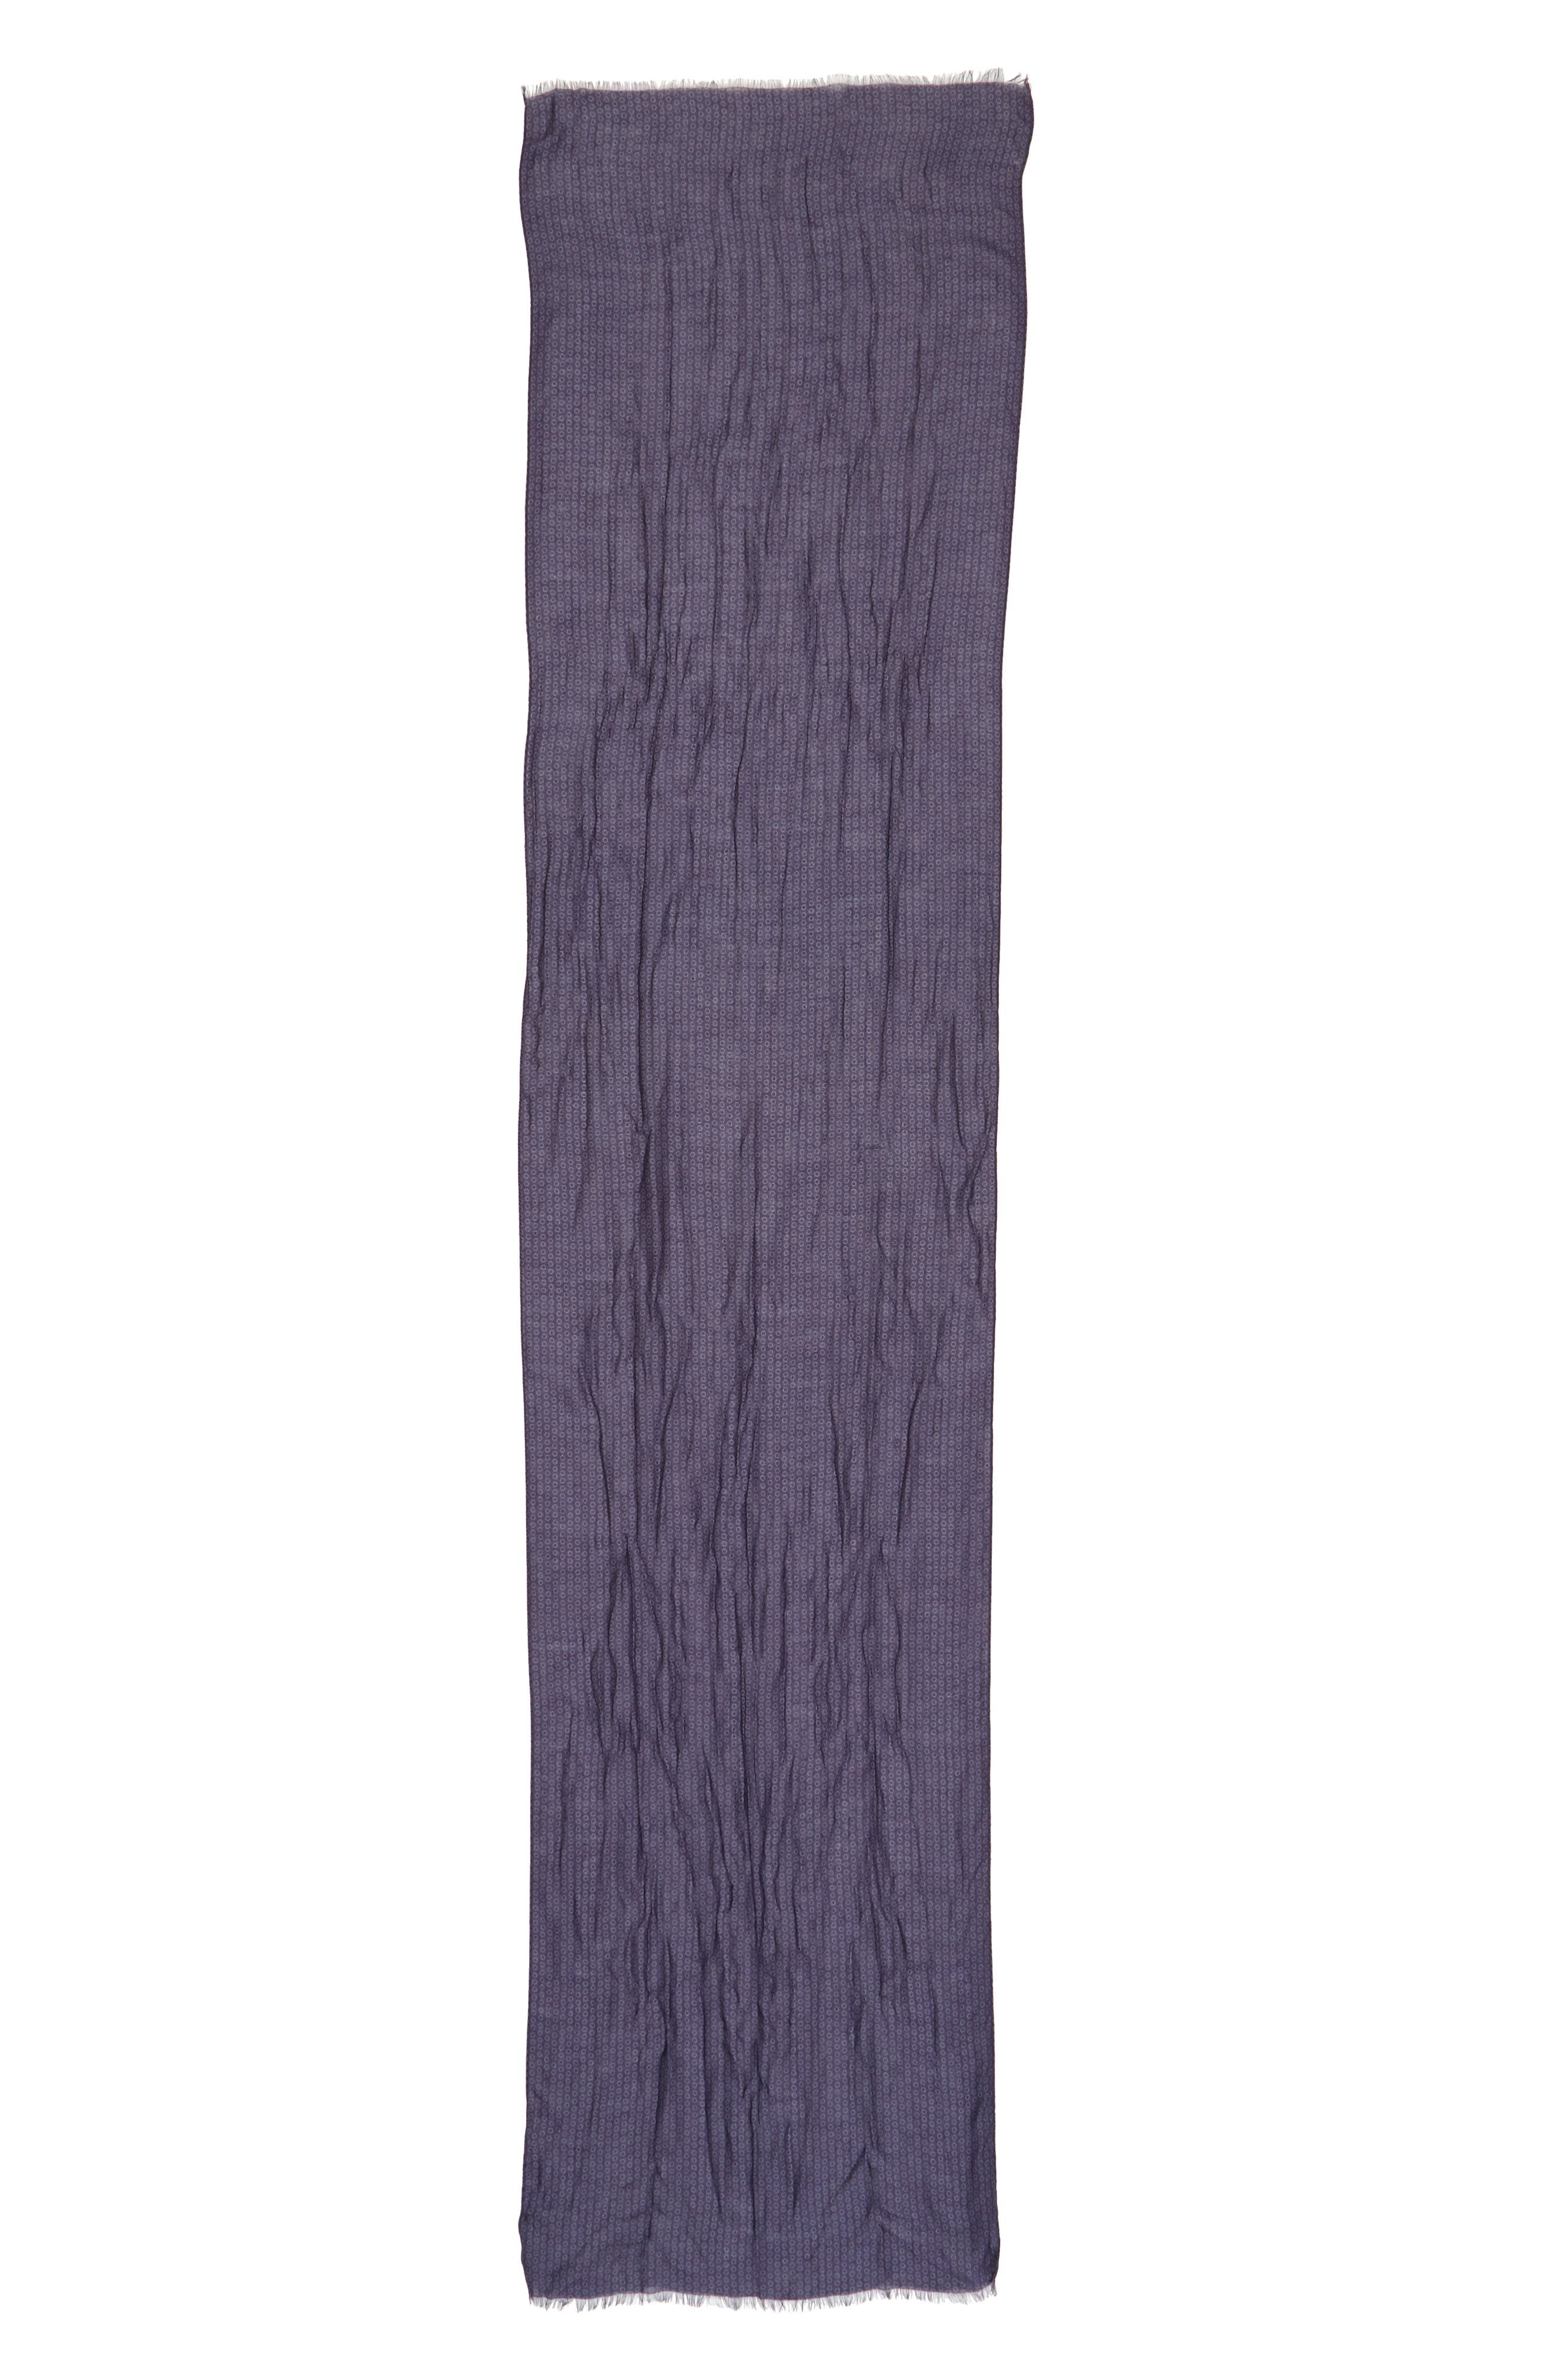 Crinkled Dot Modal & Wool Scarf,                             Alternate thumbnail 2, color,                             Antique Purple